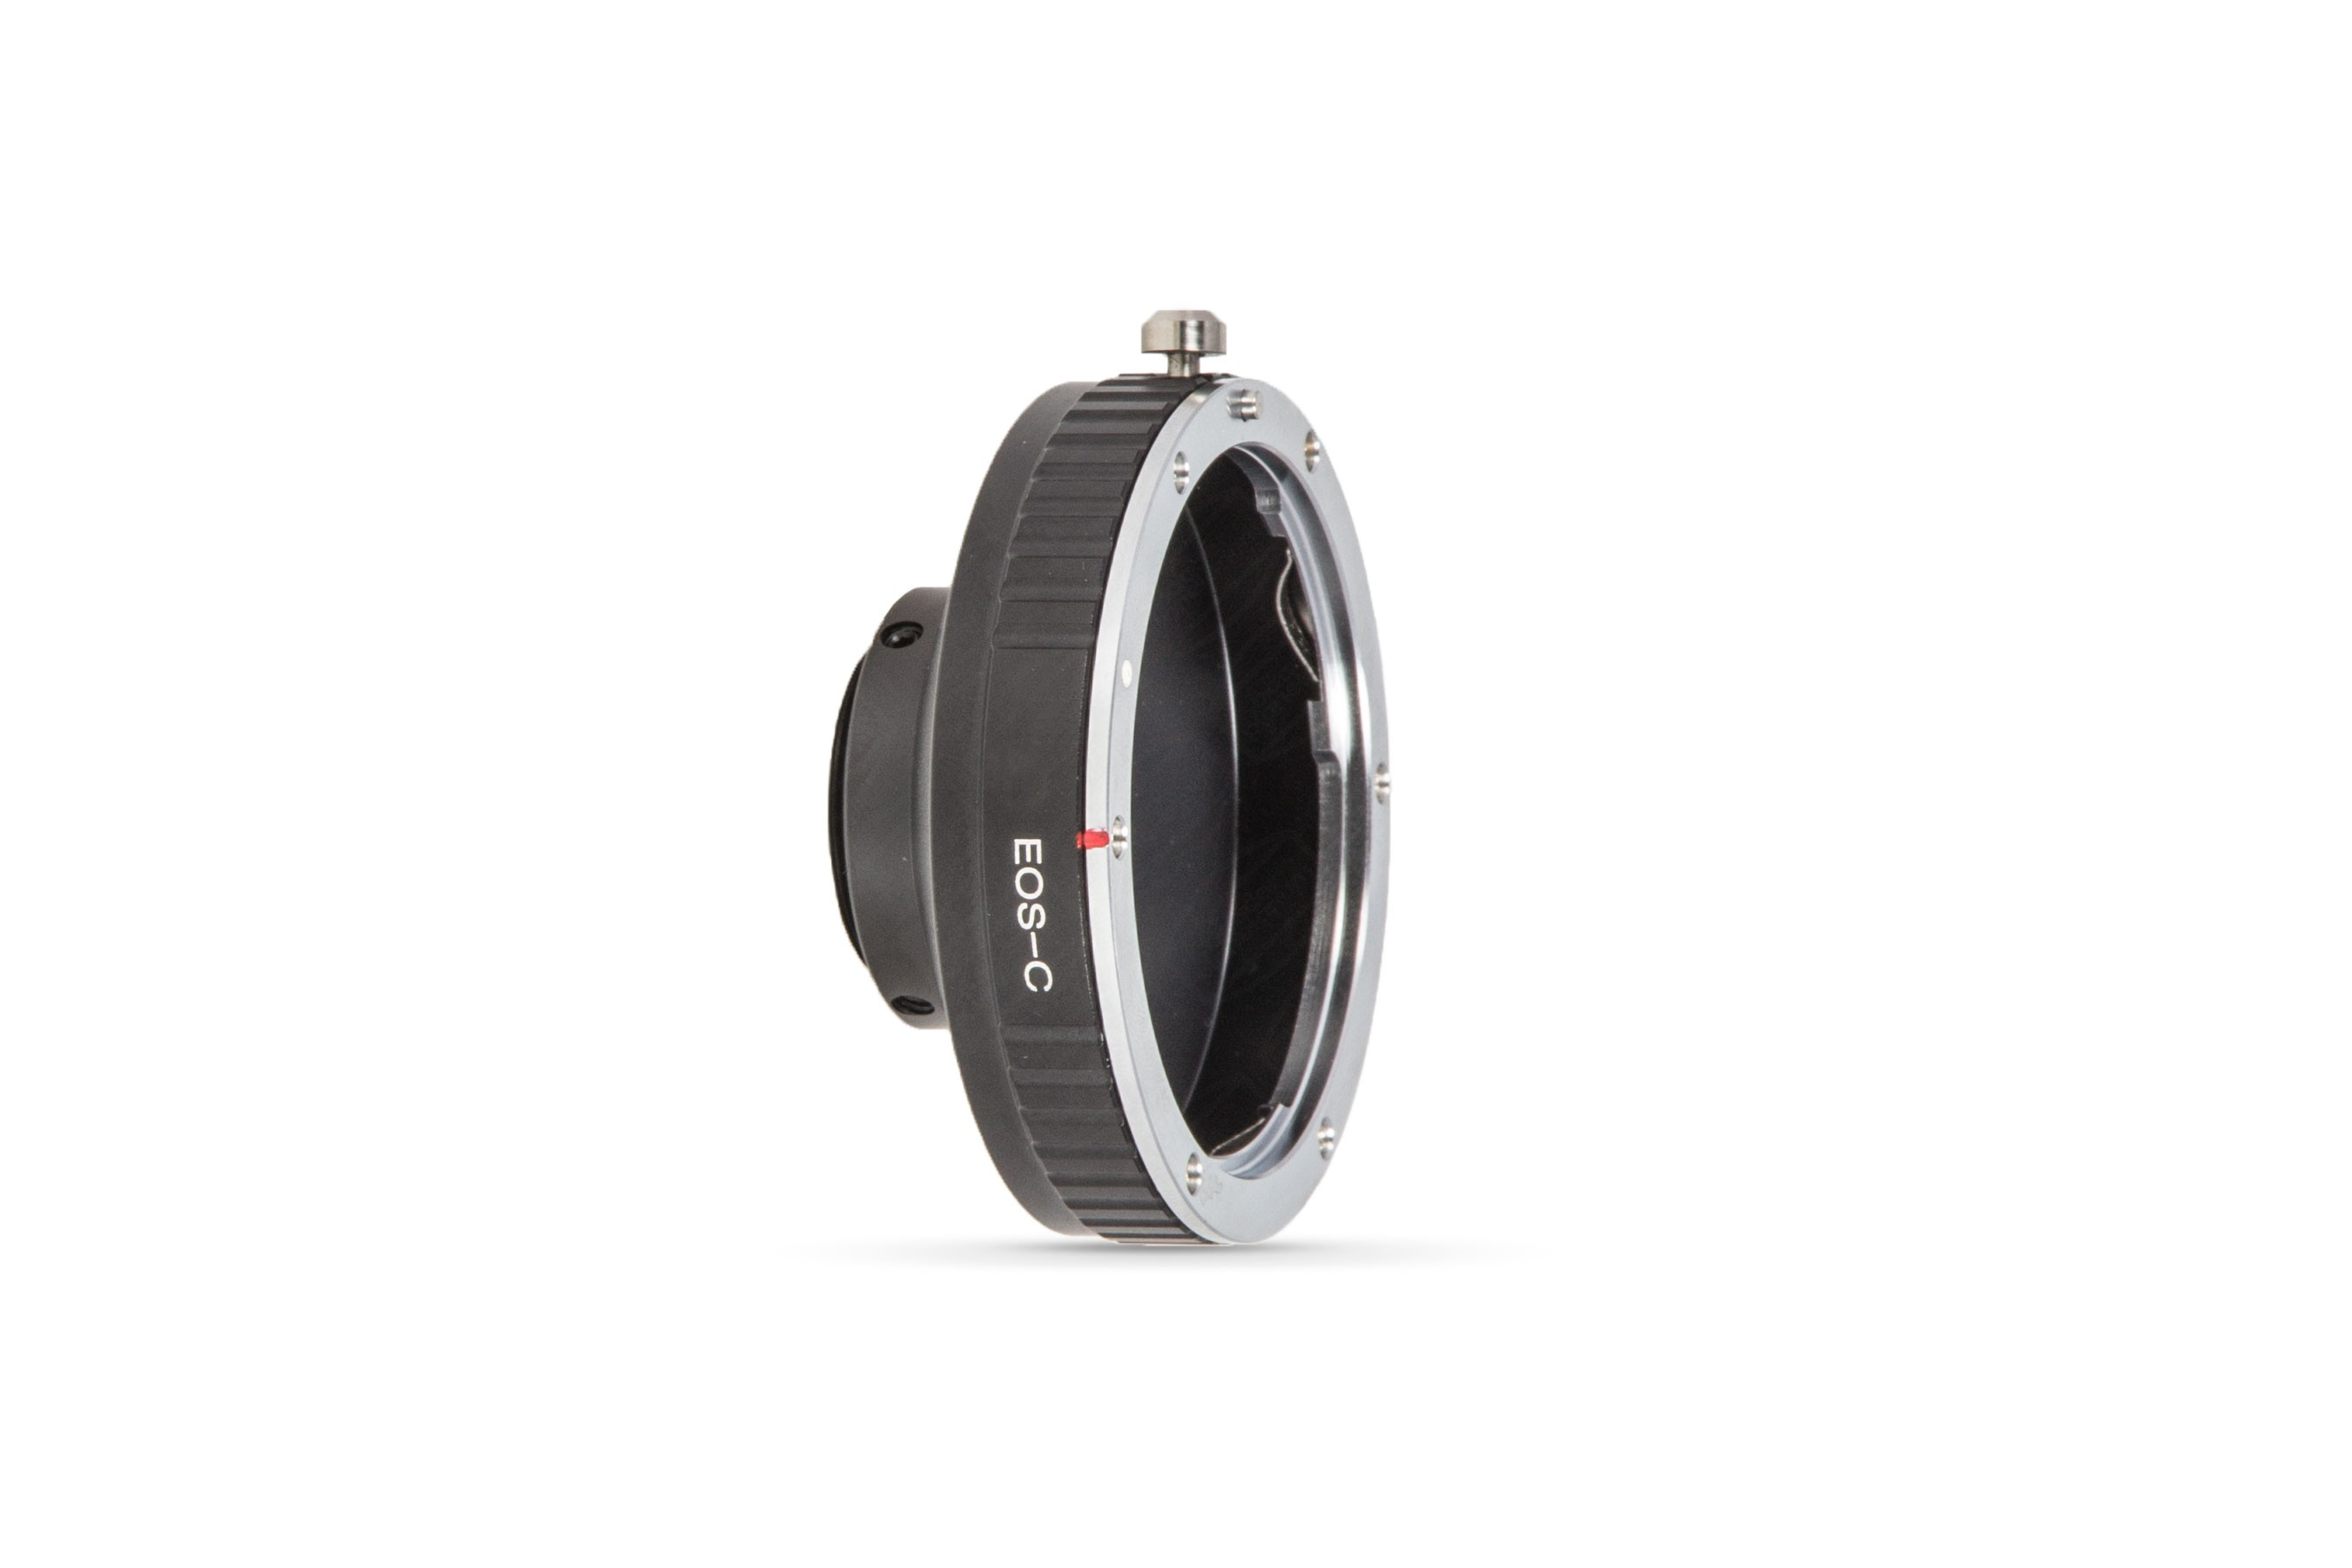 Baader C-Mount Canon EOS